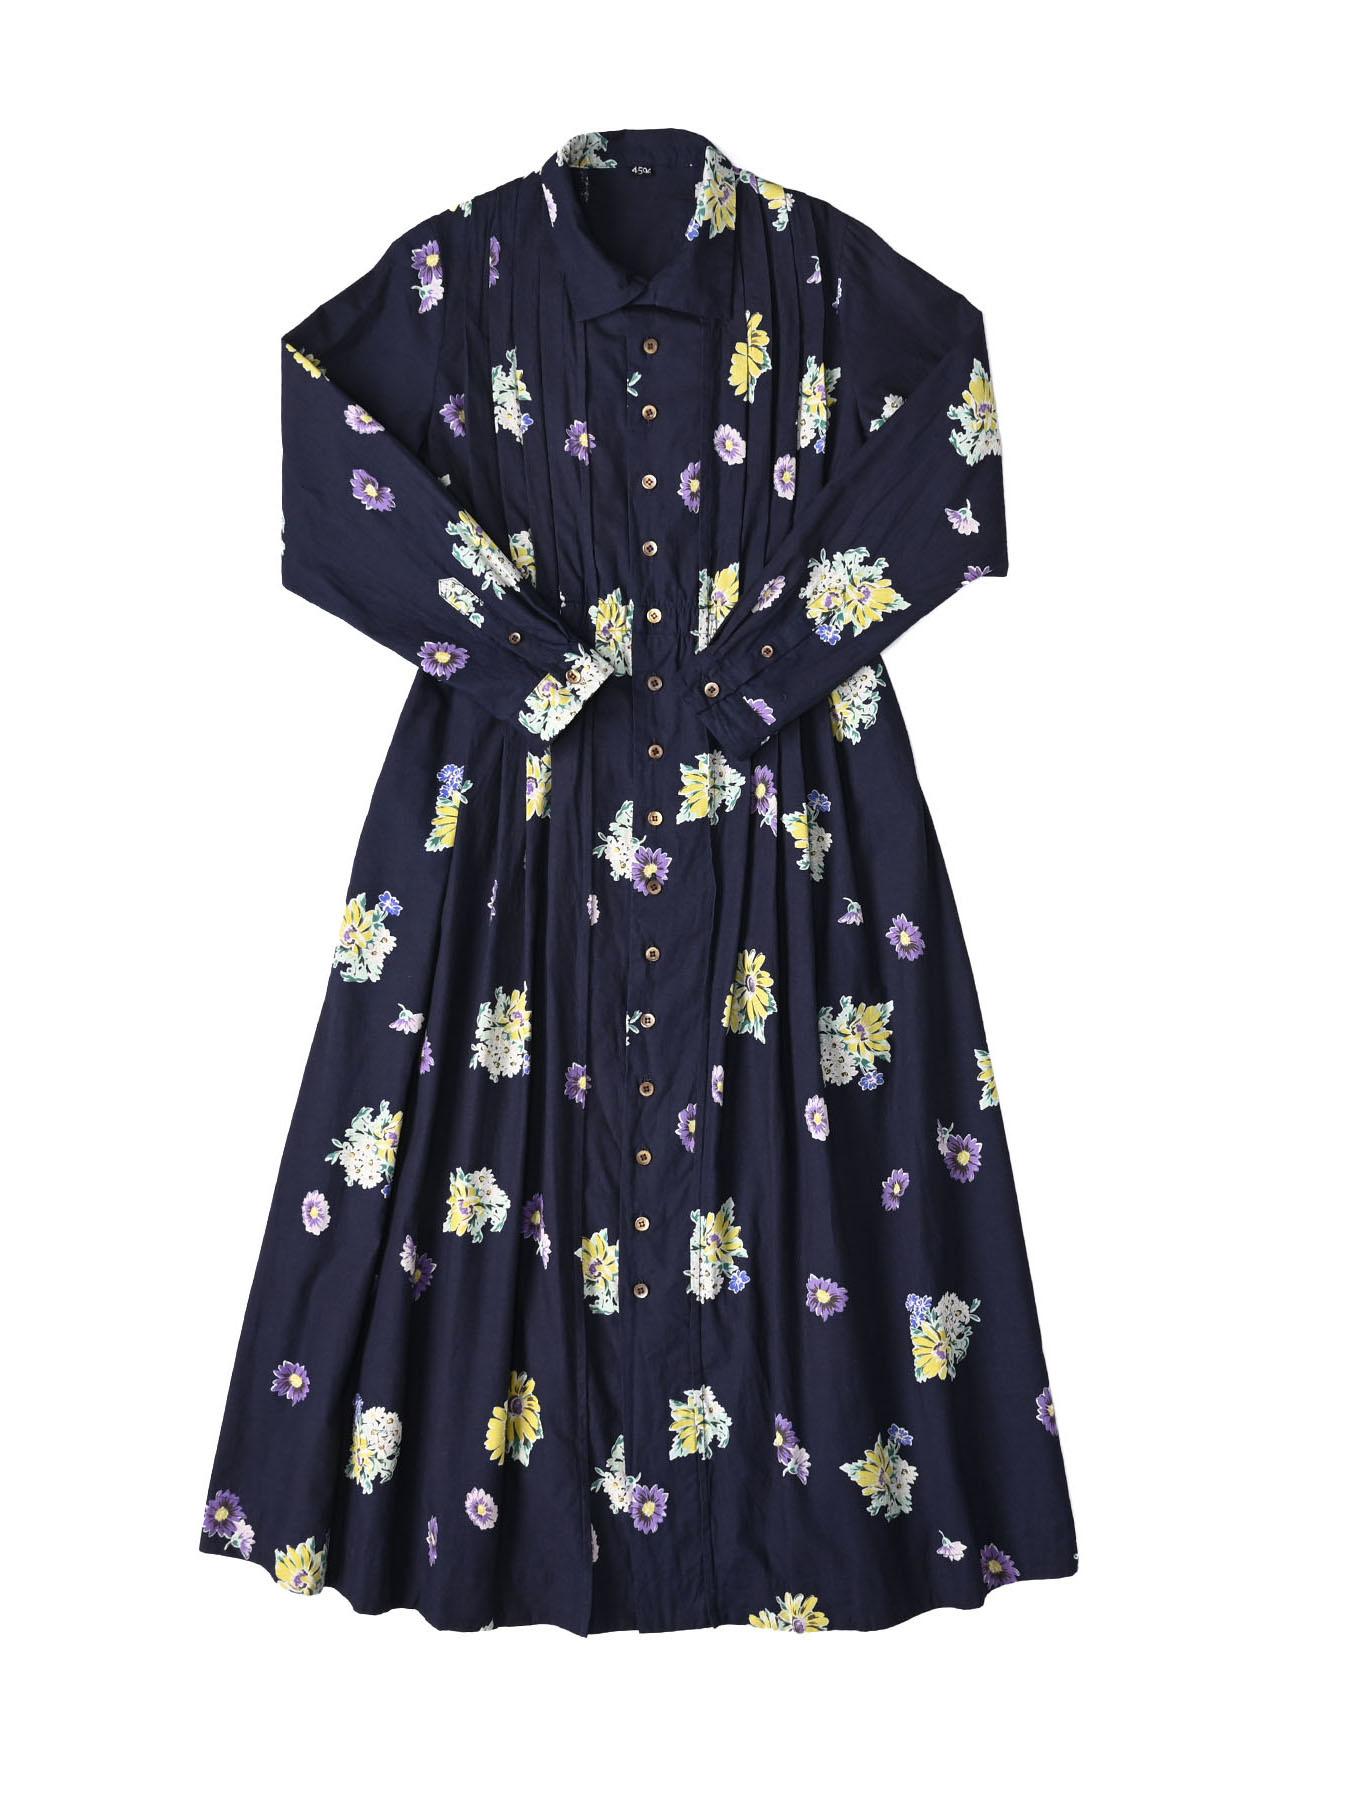 Indigo Margaret Print Dress-1